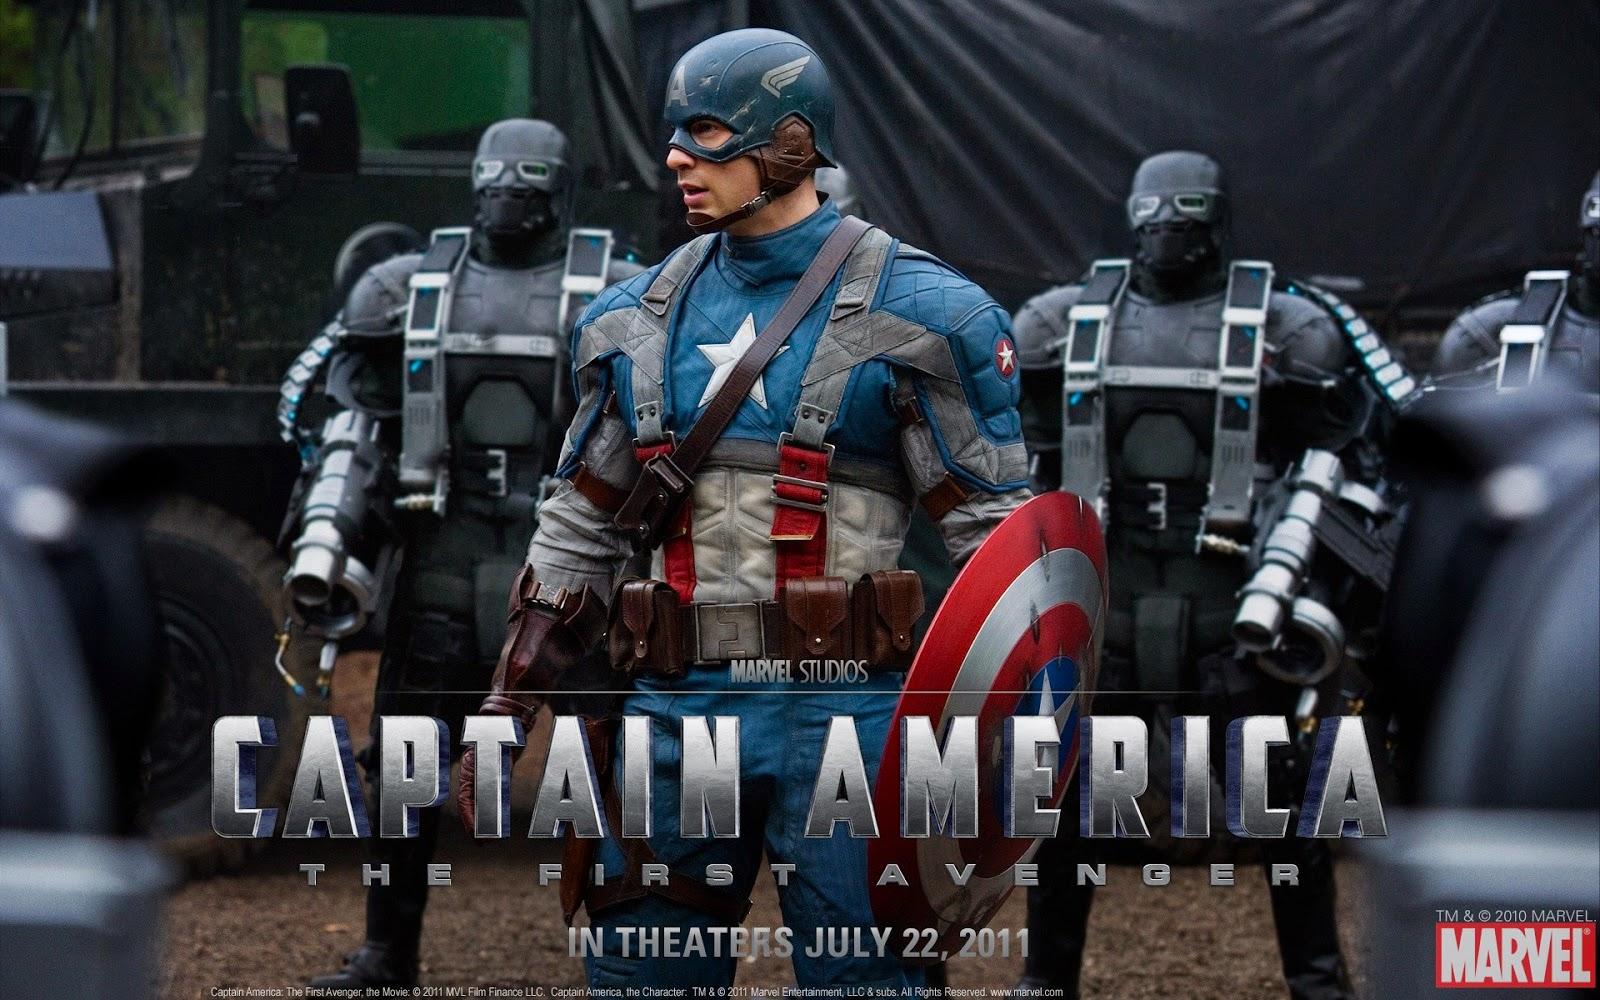 Wallpapers Hd Autos Fondos De Pantallas Hd: Wallpapers Captain America (The First Avenger) HD